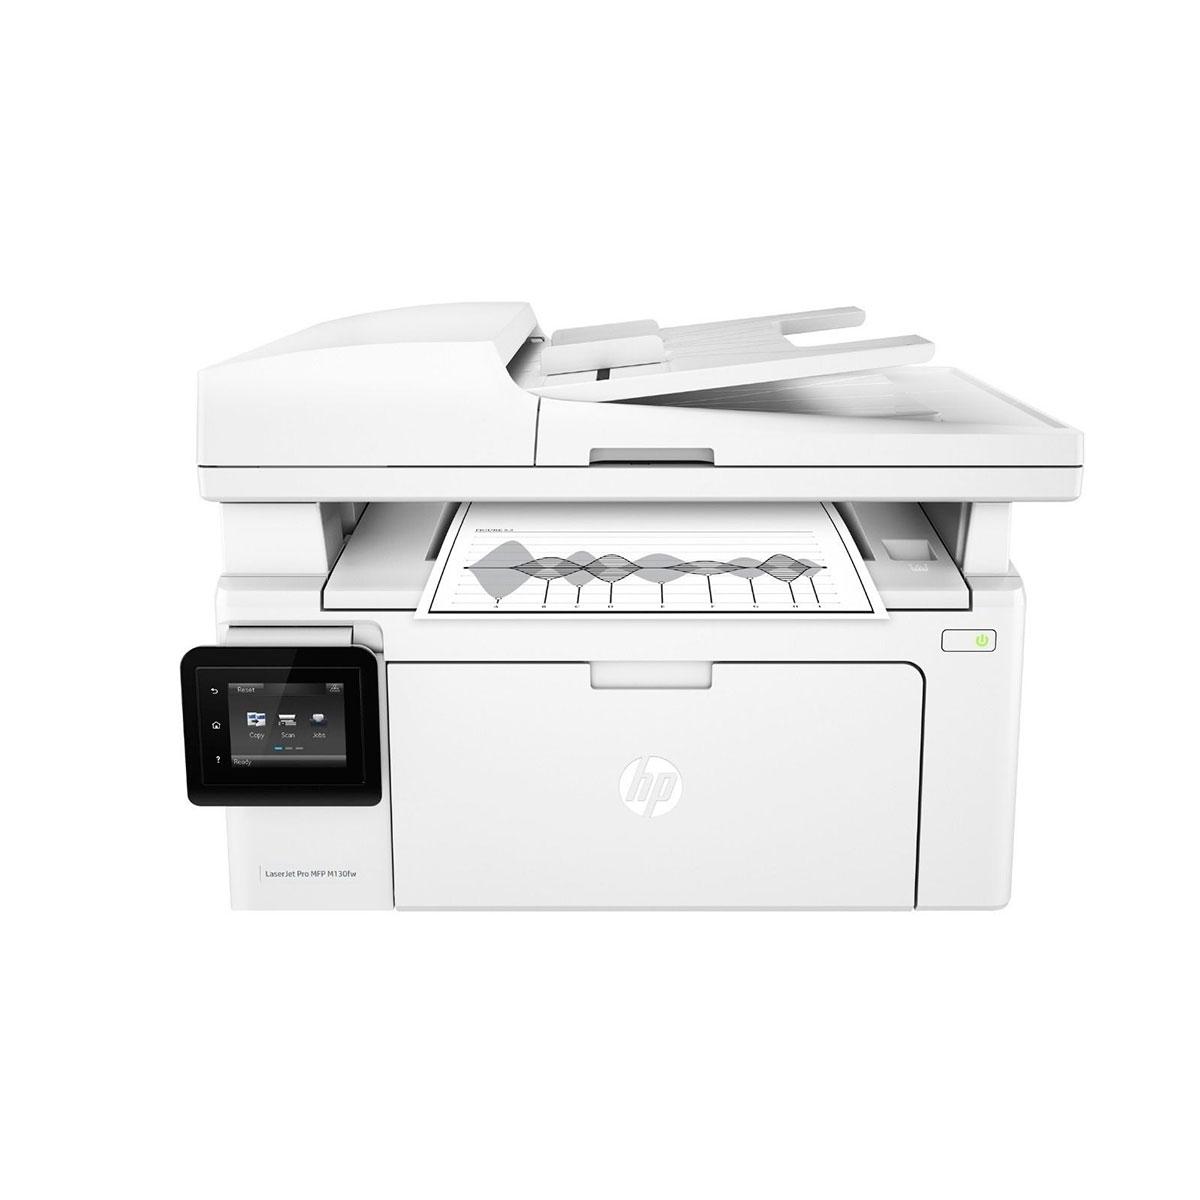 Impresora HP LaserJet Pro M130fw